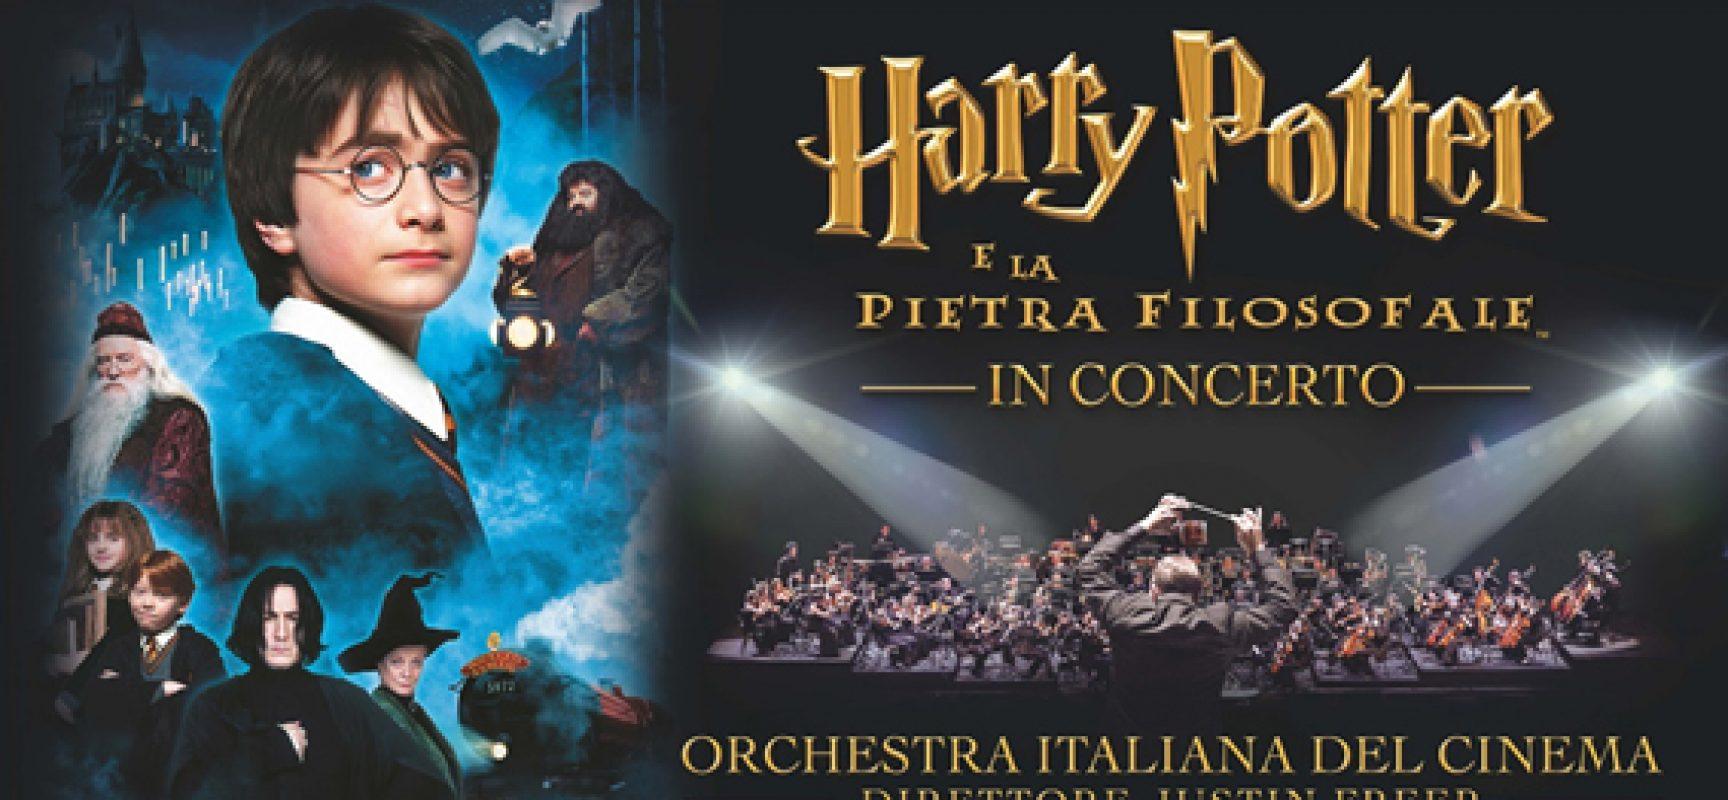 Harry Potter a Napoli